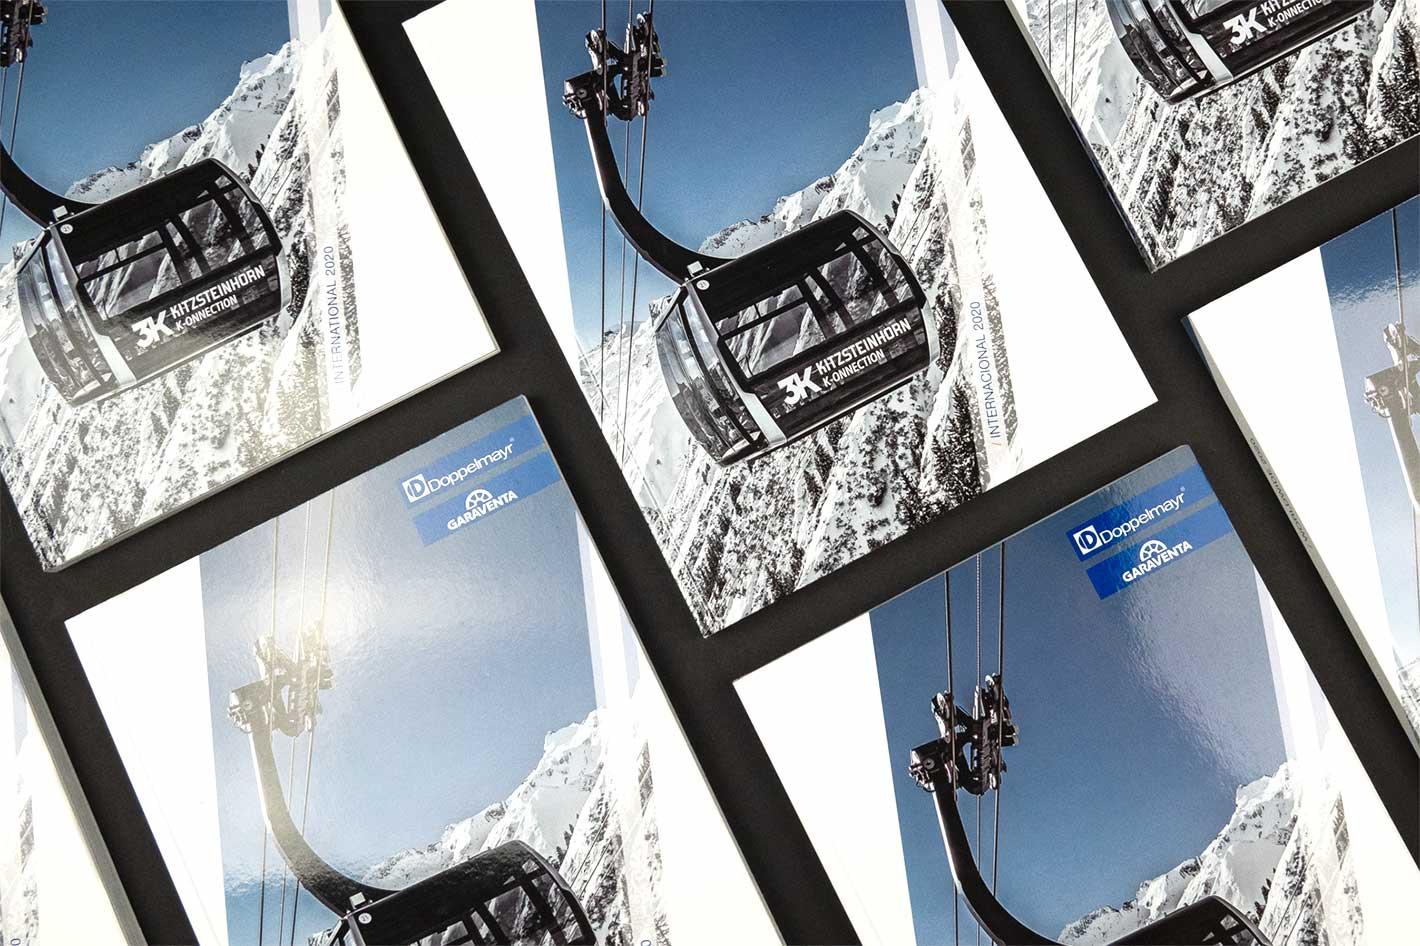 Doppelmayr Jahrbuch Cover